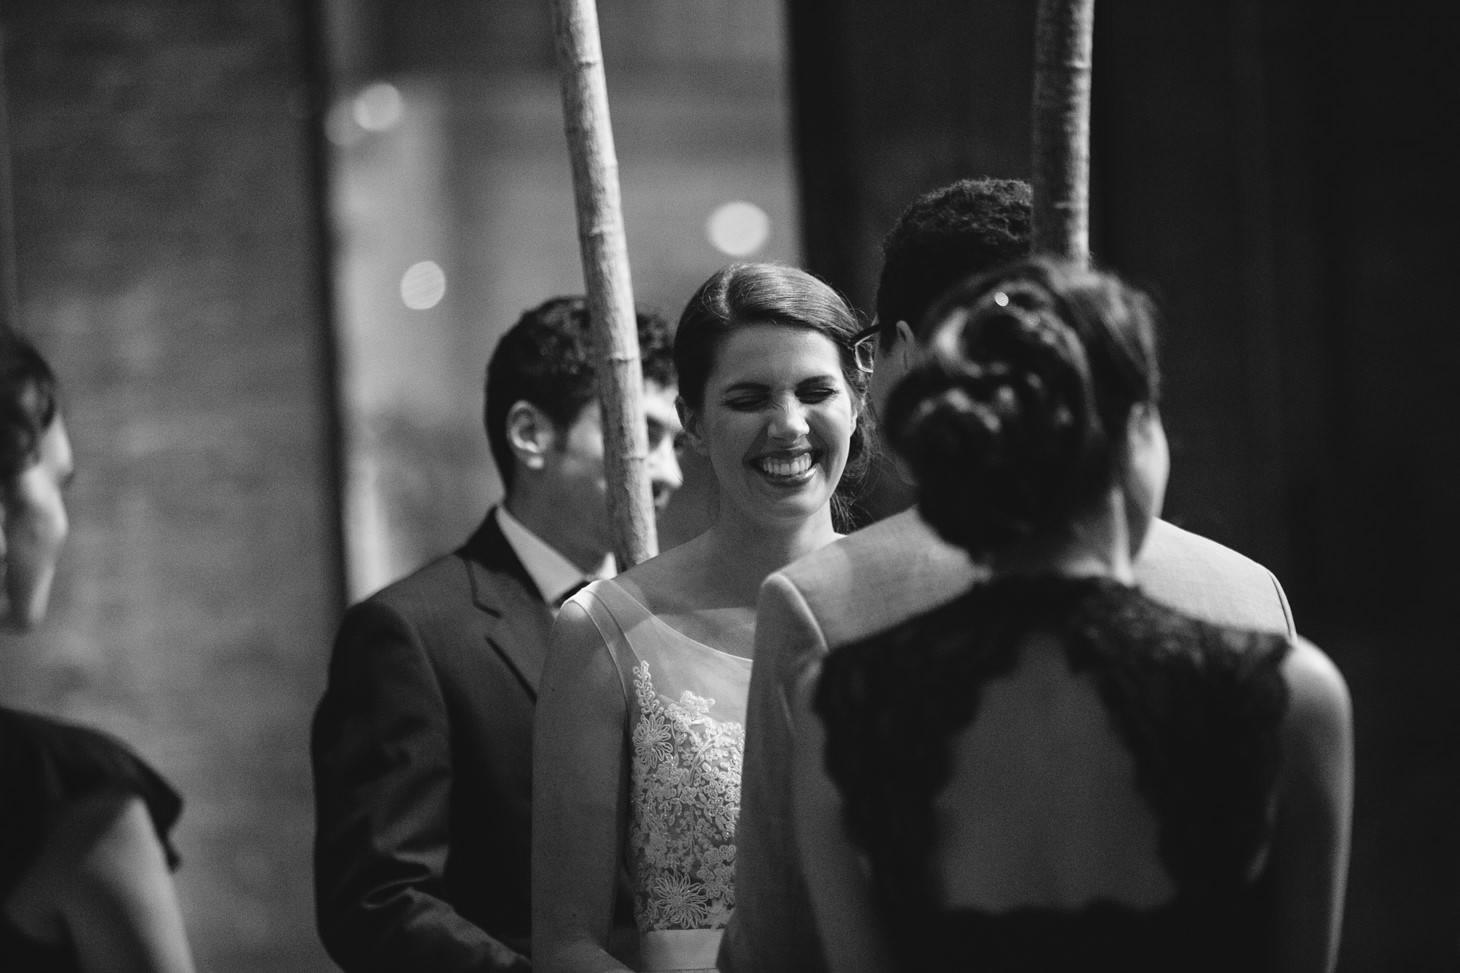 019-nyc-dumbo-loft-brooklyn-wedding-photographer-smitten-chickens-photo-.jpg